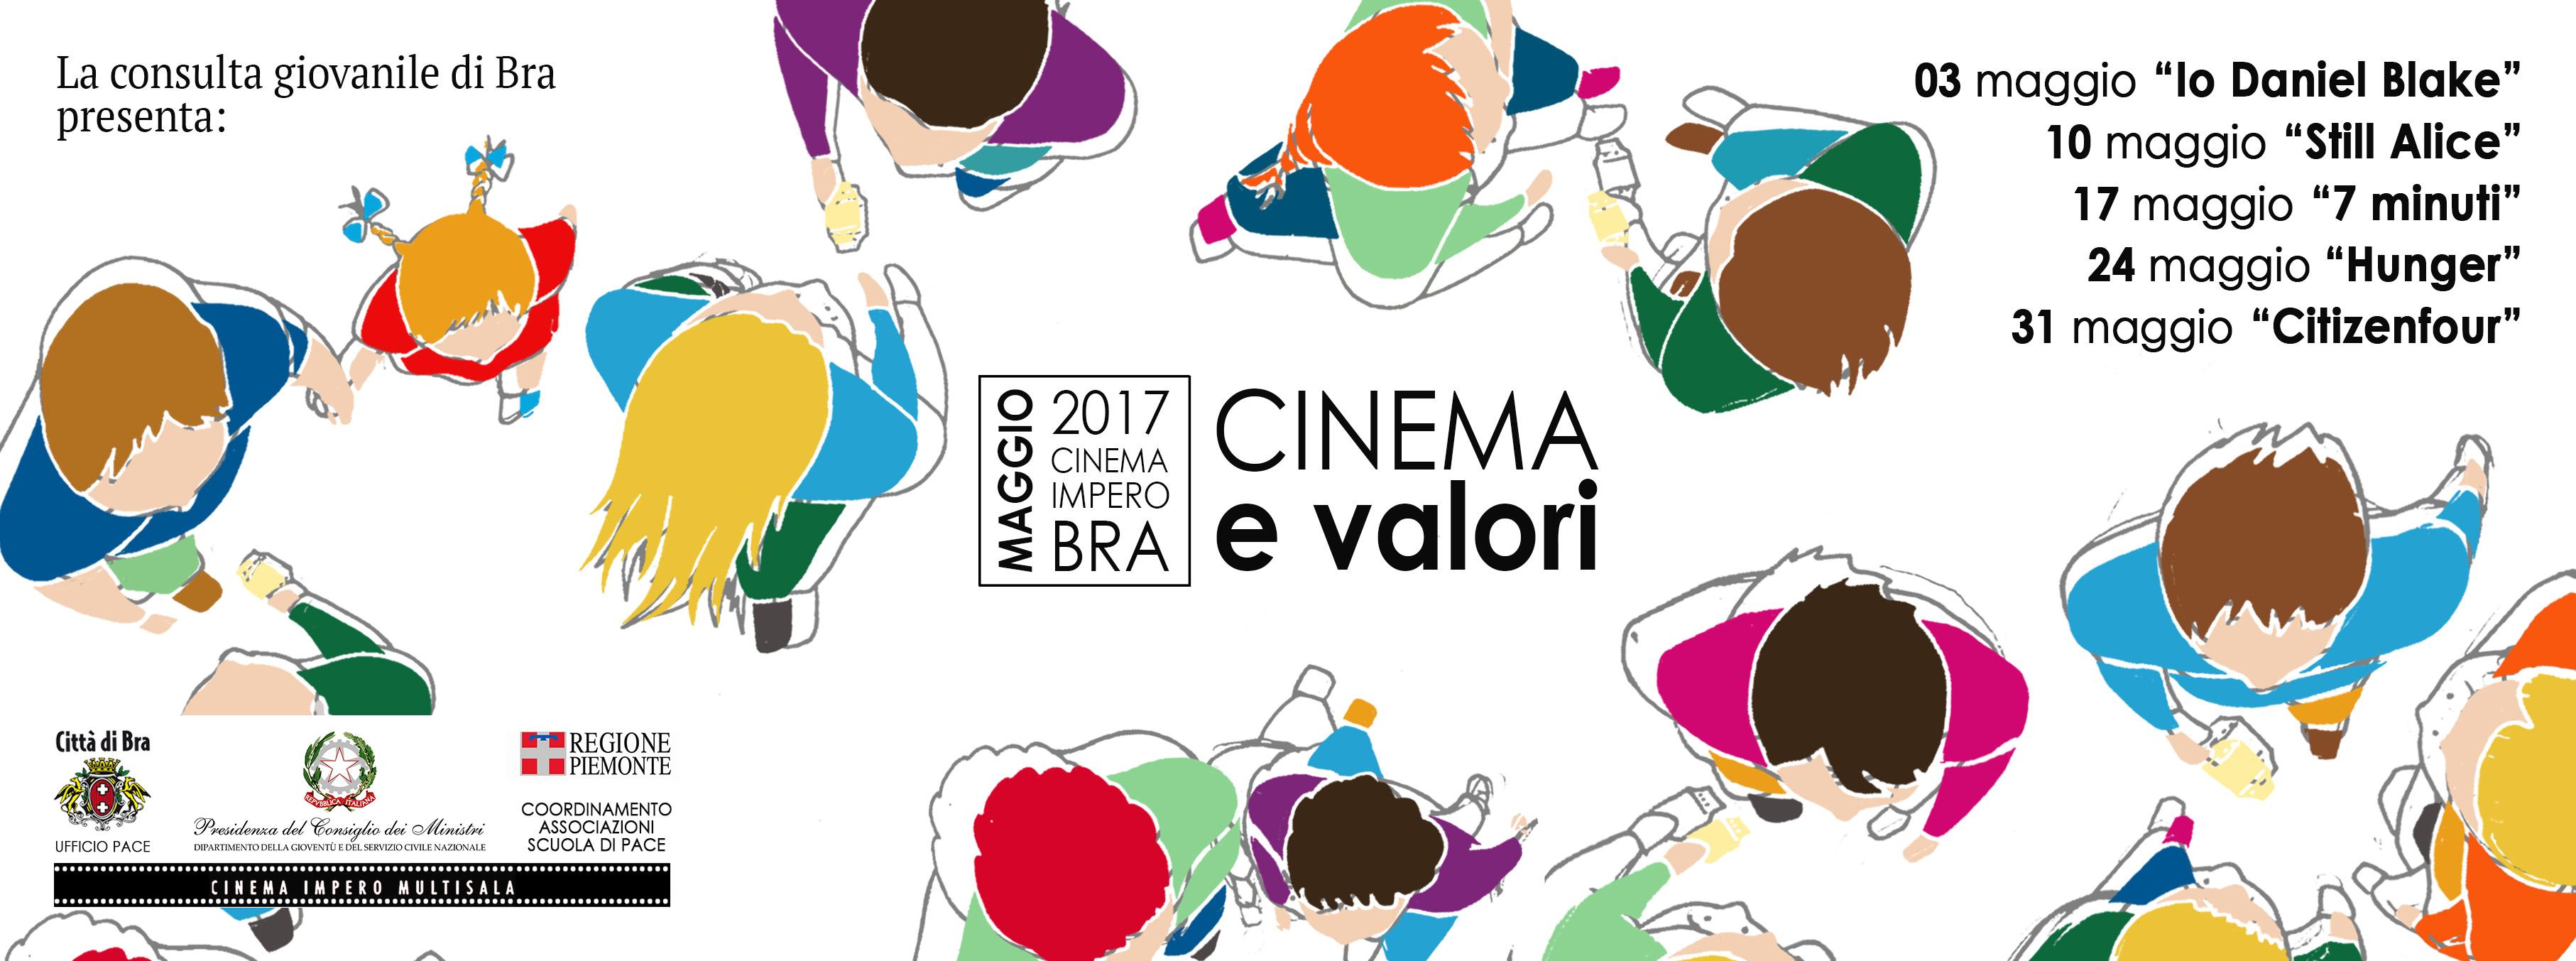 cinema-e-valori_fb